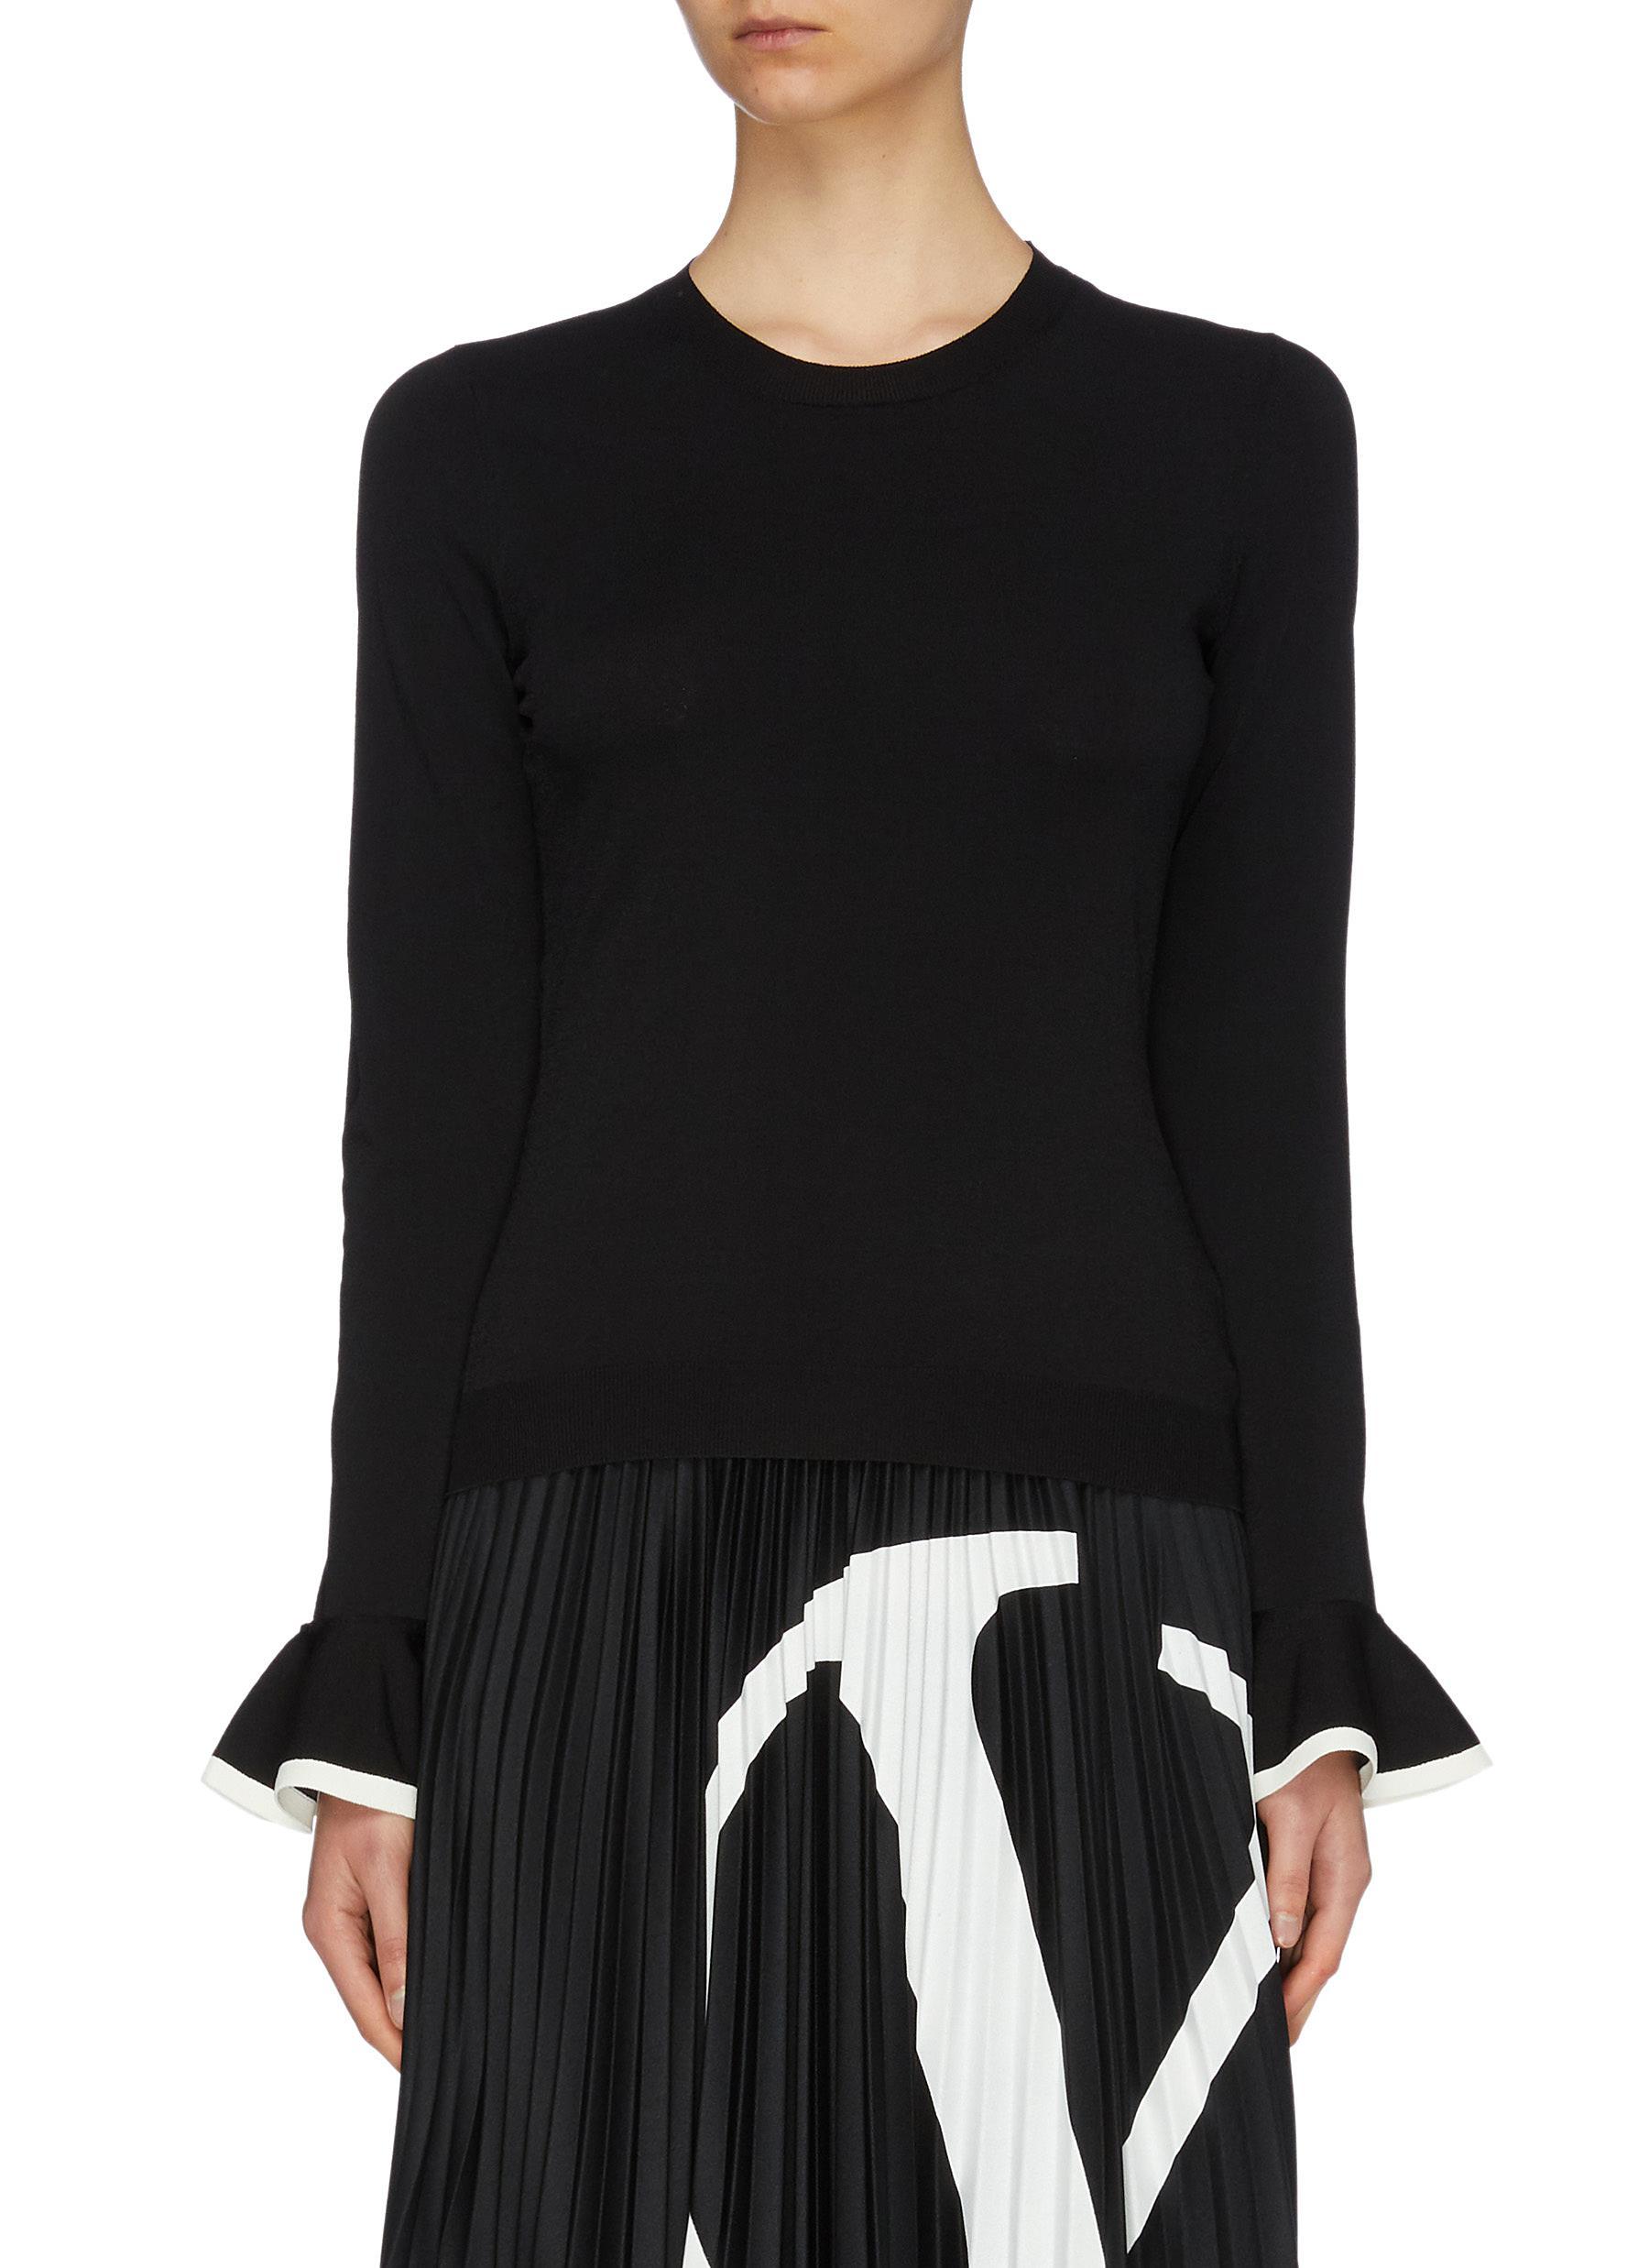 Contrast trim ruffle cuff sweater by Valentino